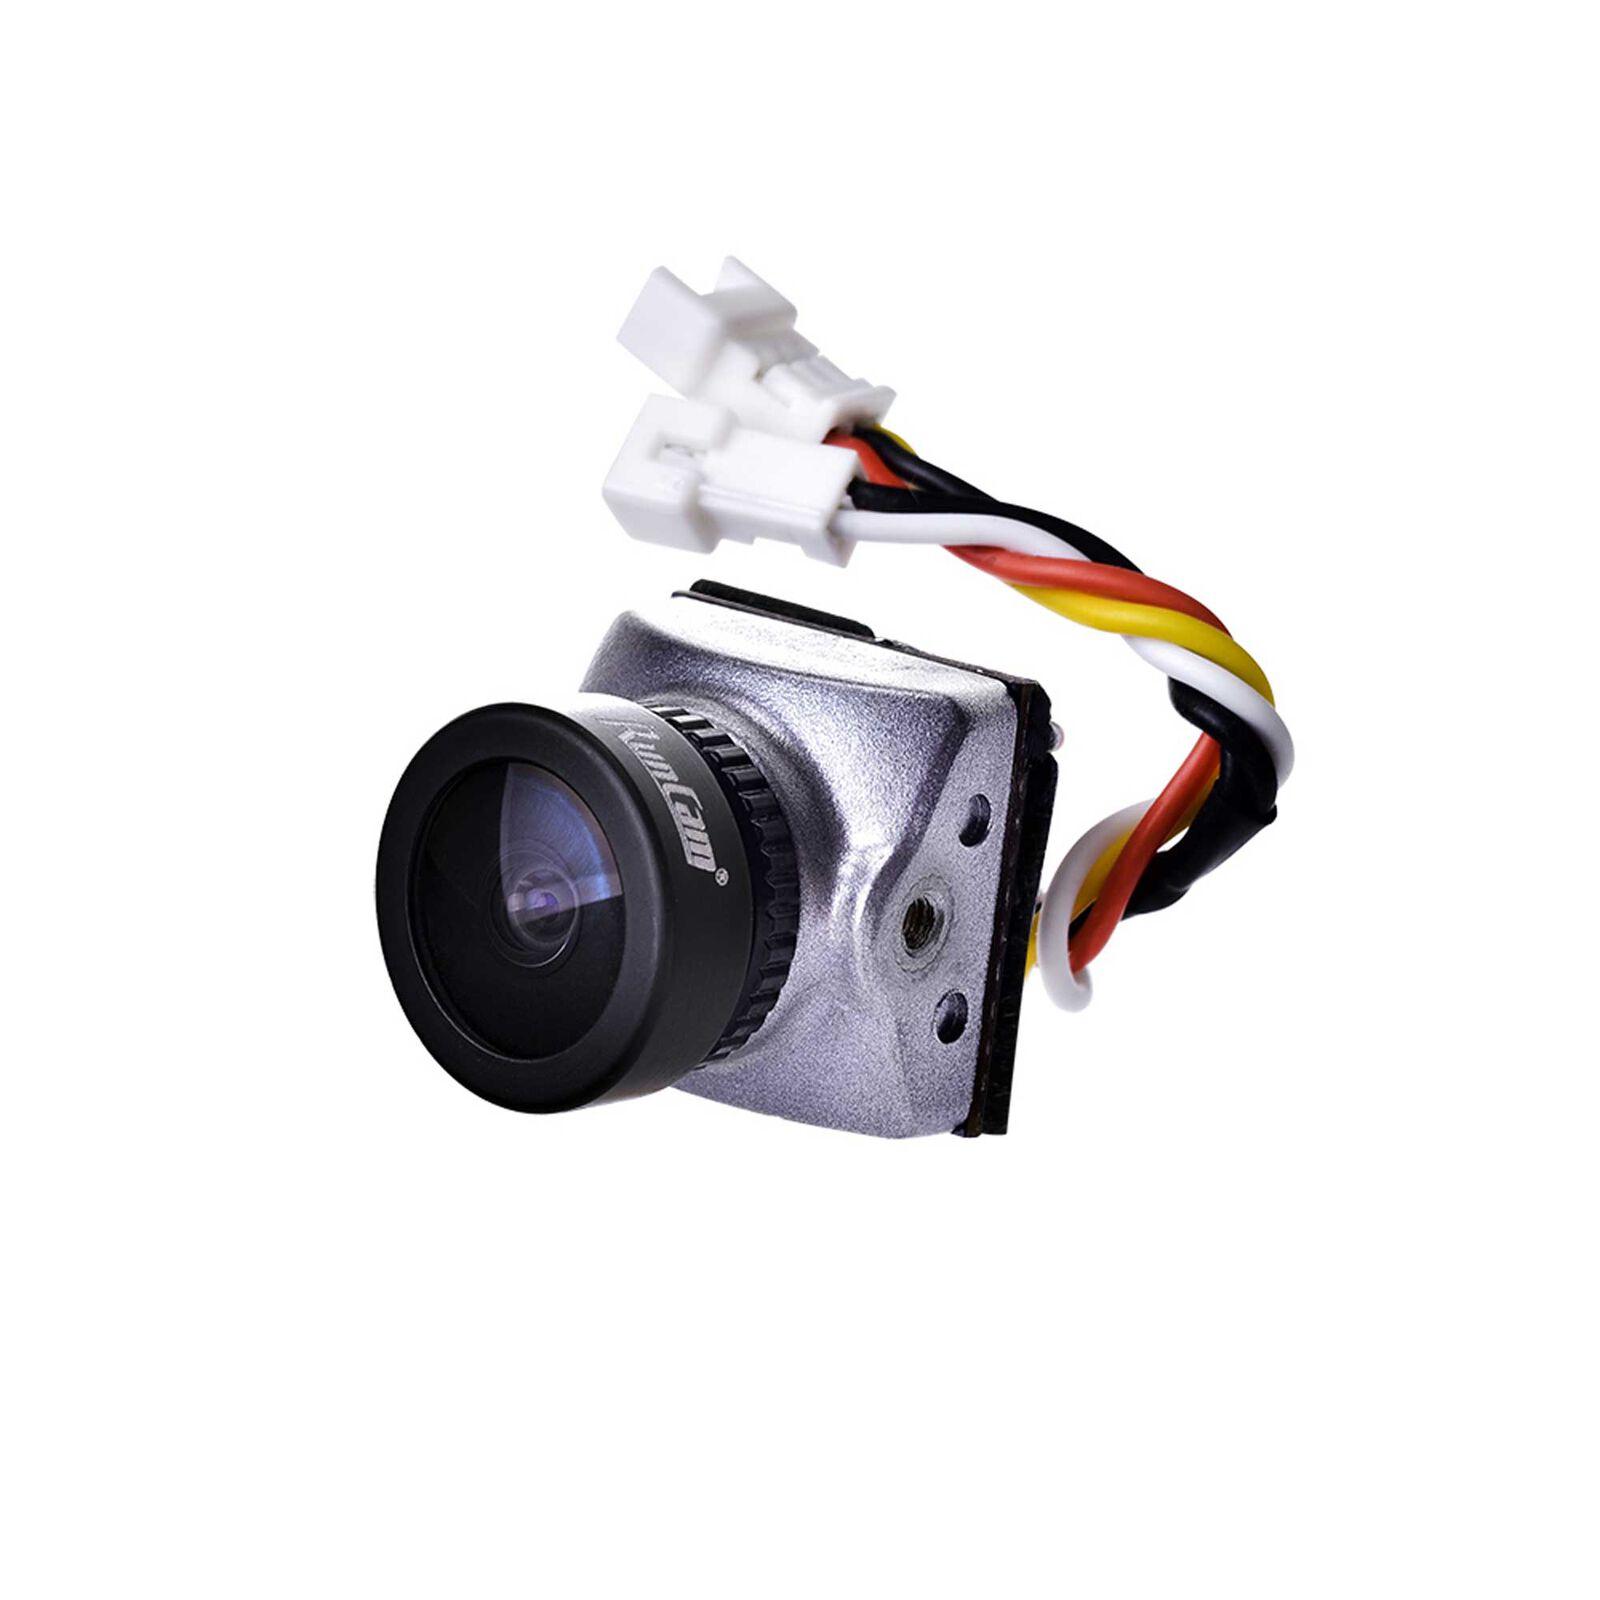 Racer NanoWDR Camera, 2.1 mm Lens